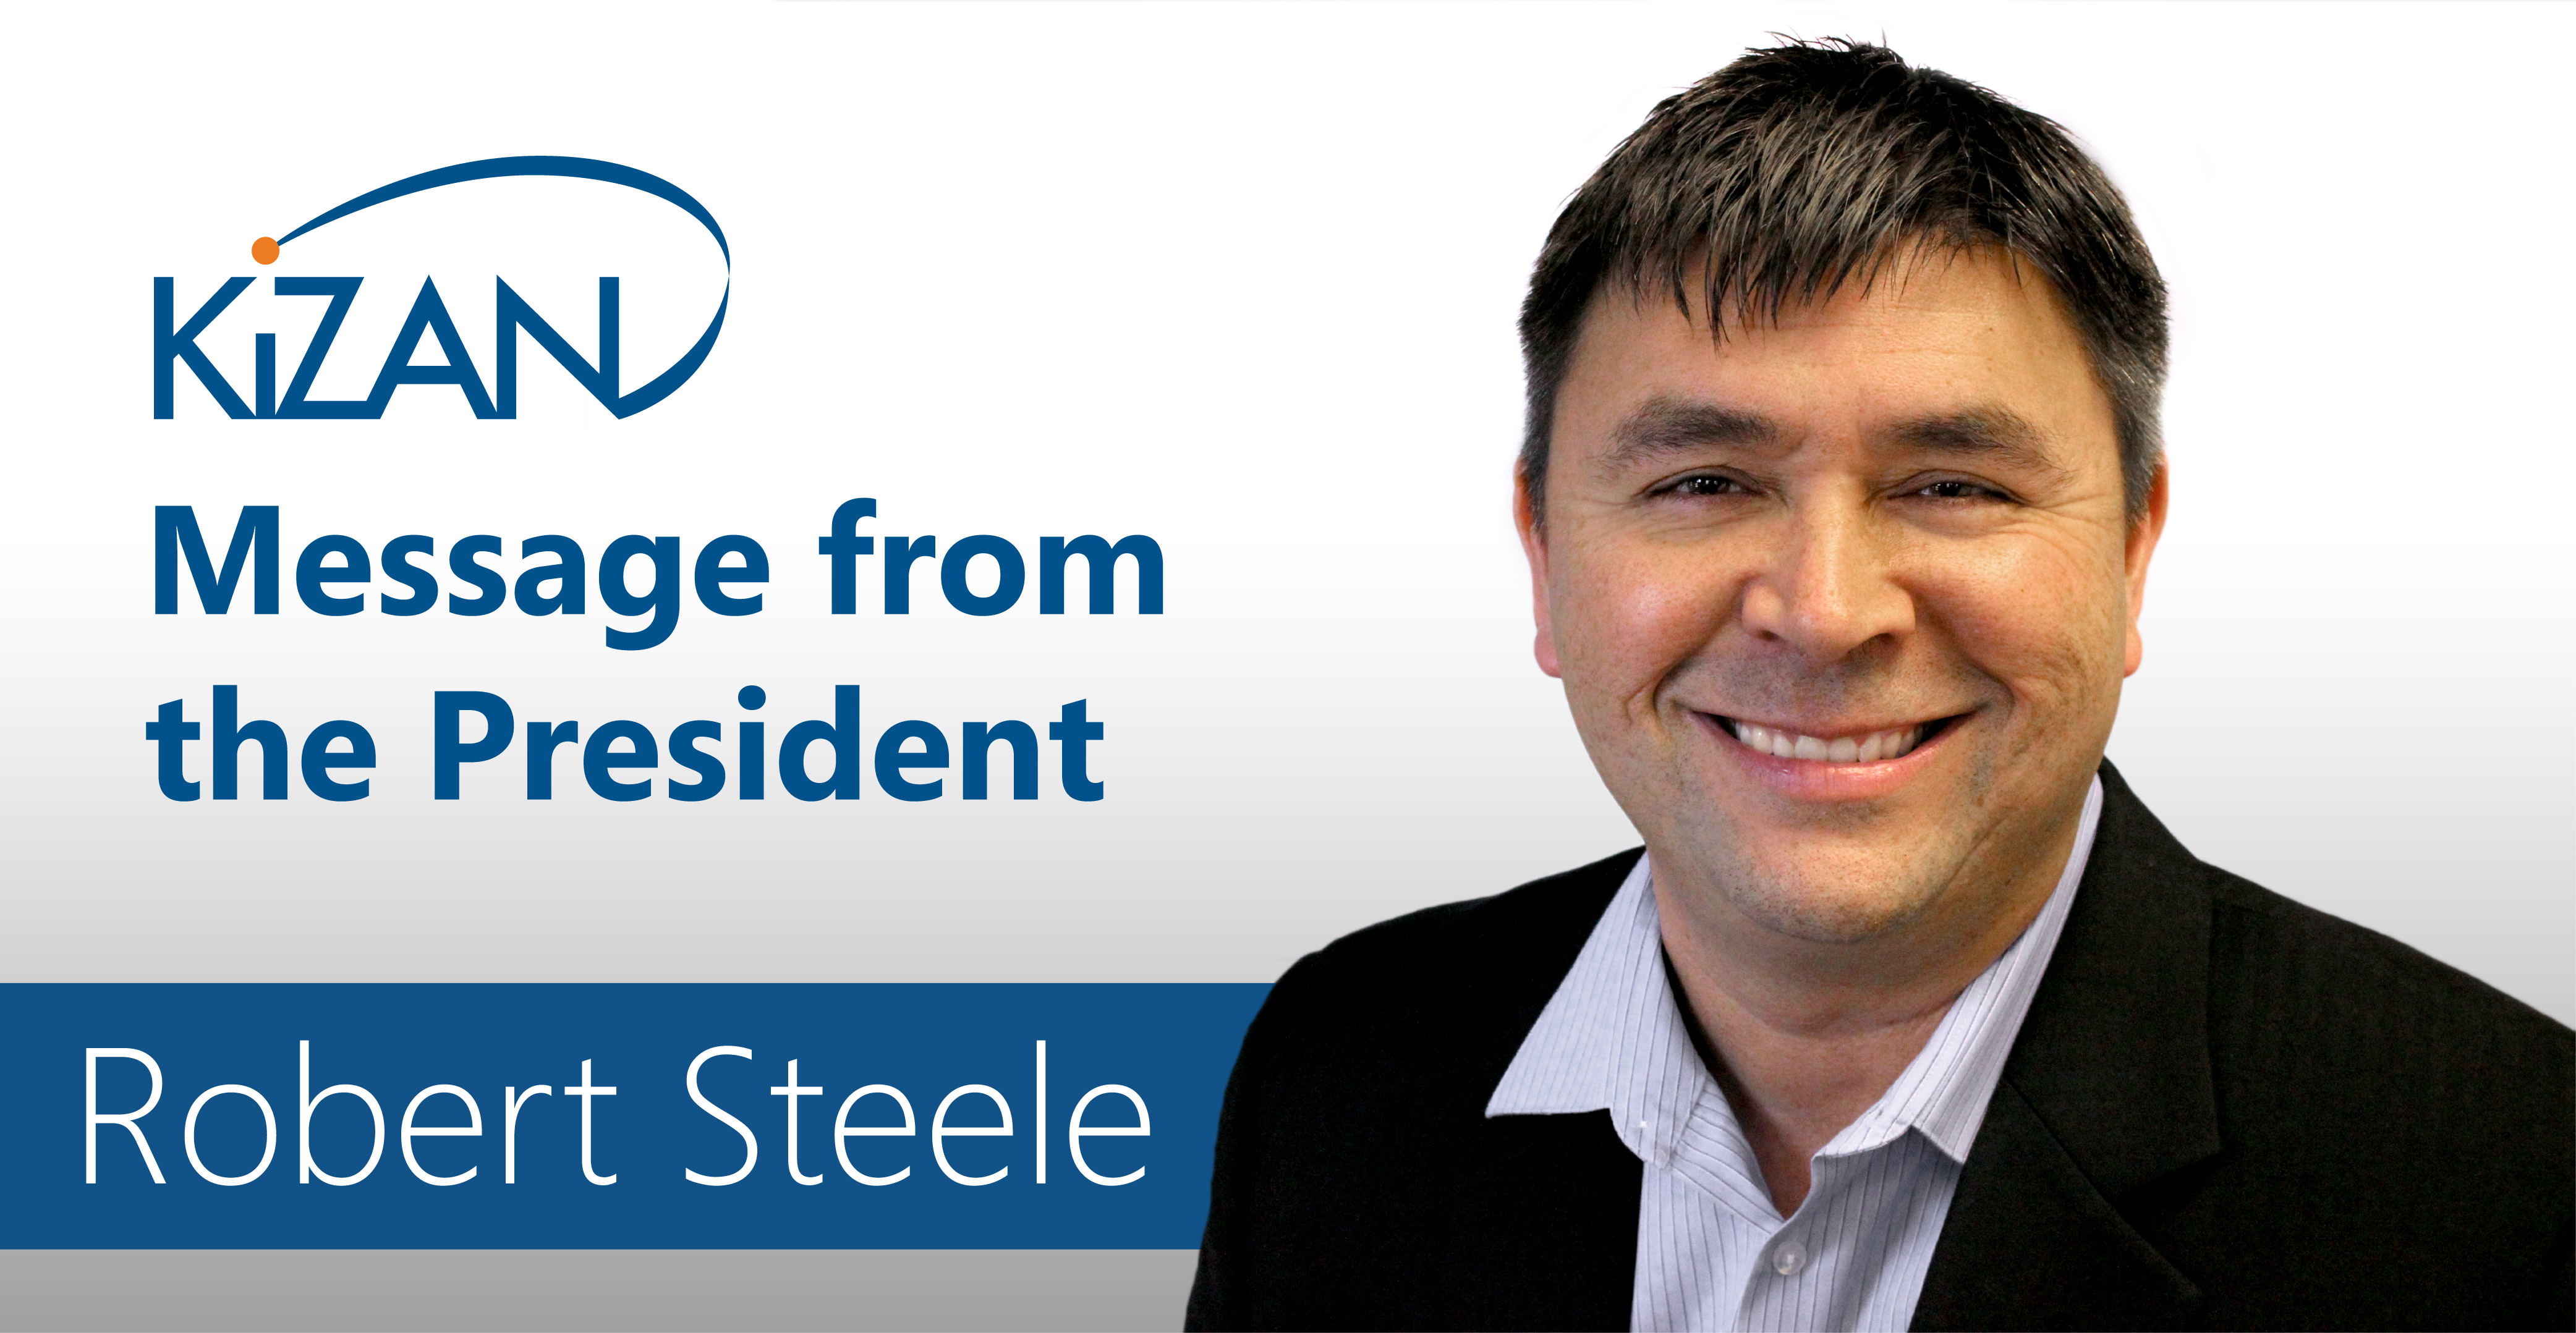 KiZAN: Message from the President Robert Steele